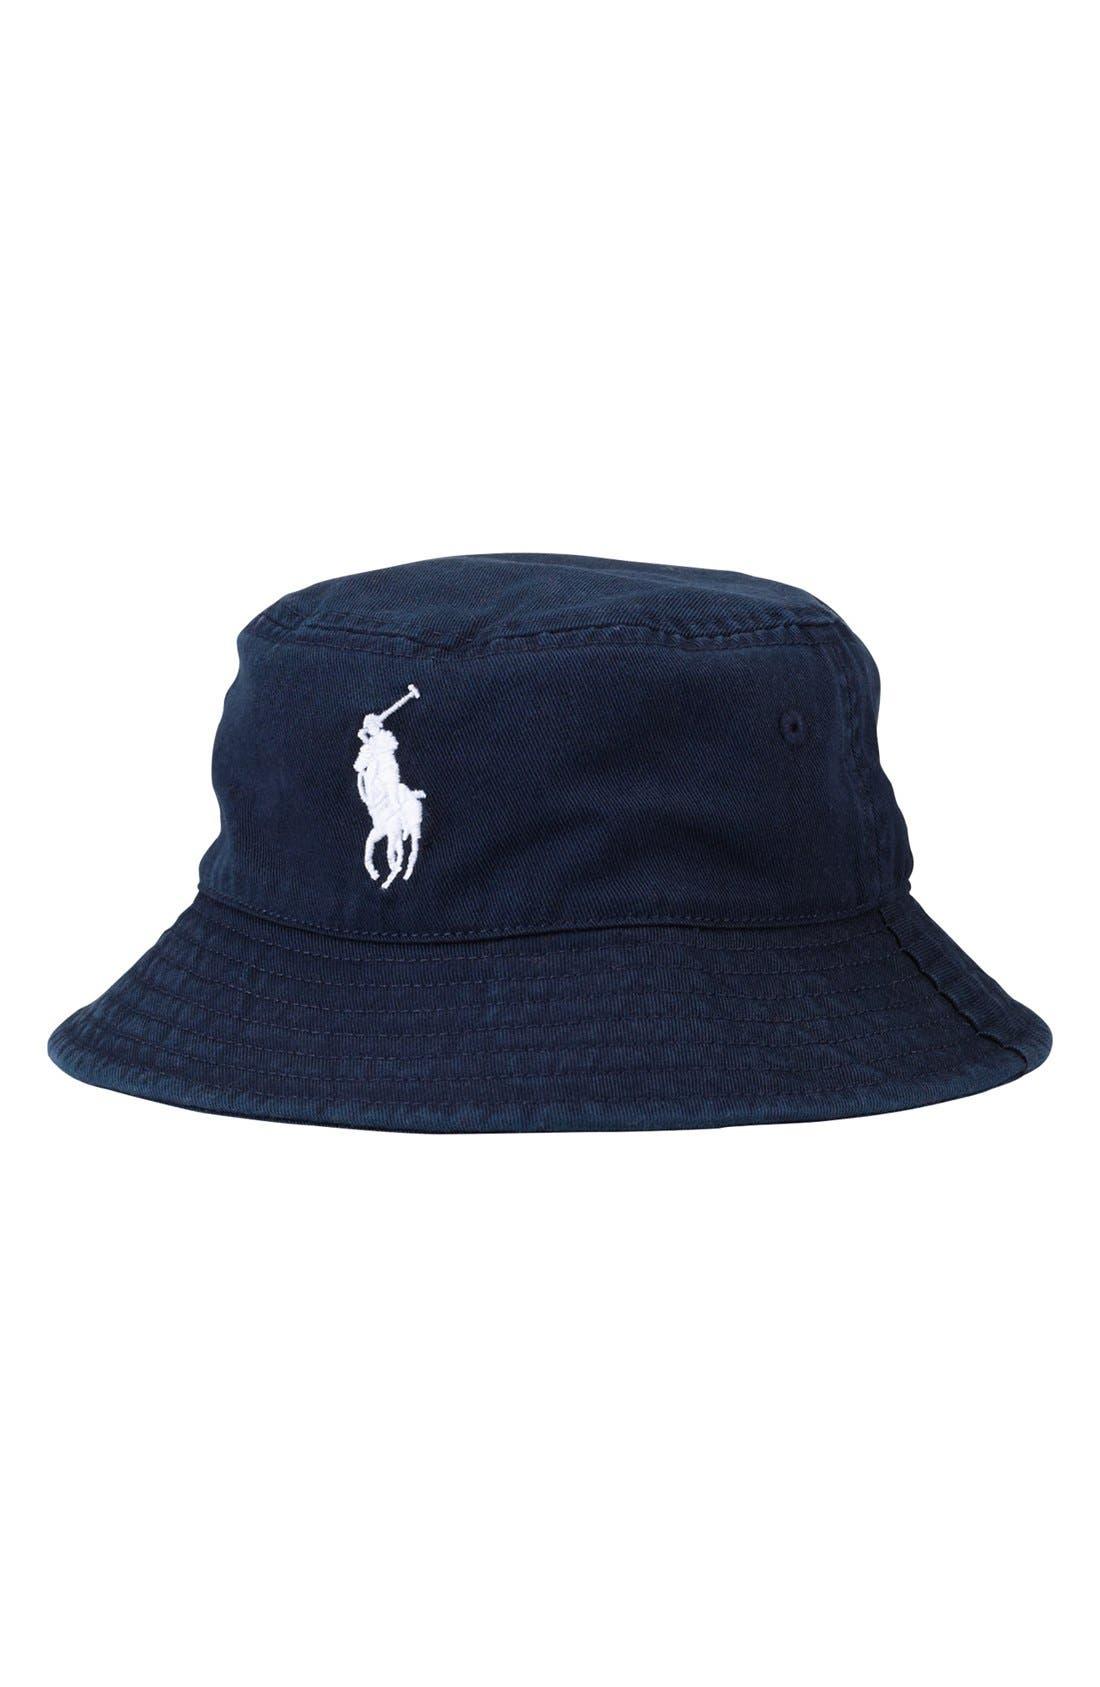 Alternate Image 1 Selected - Ralph Lauren Chino Bucket Hat (Toddler Boys)